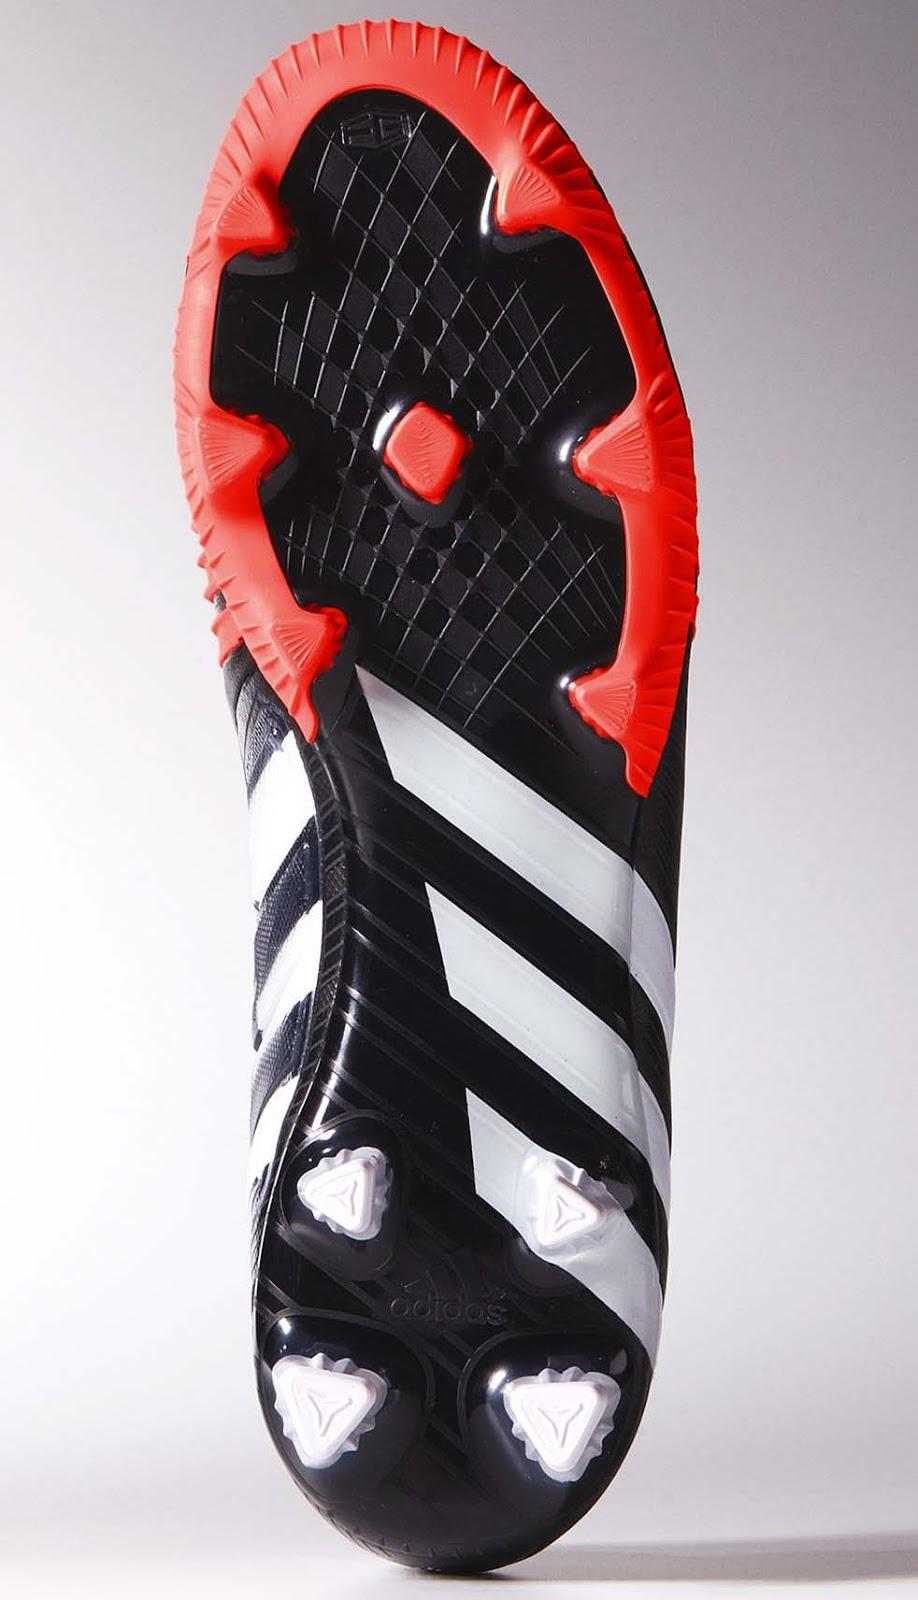 Black-Red-Adidas-Predator-Instinct-3